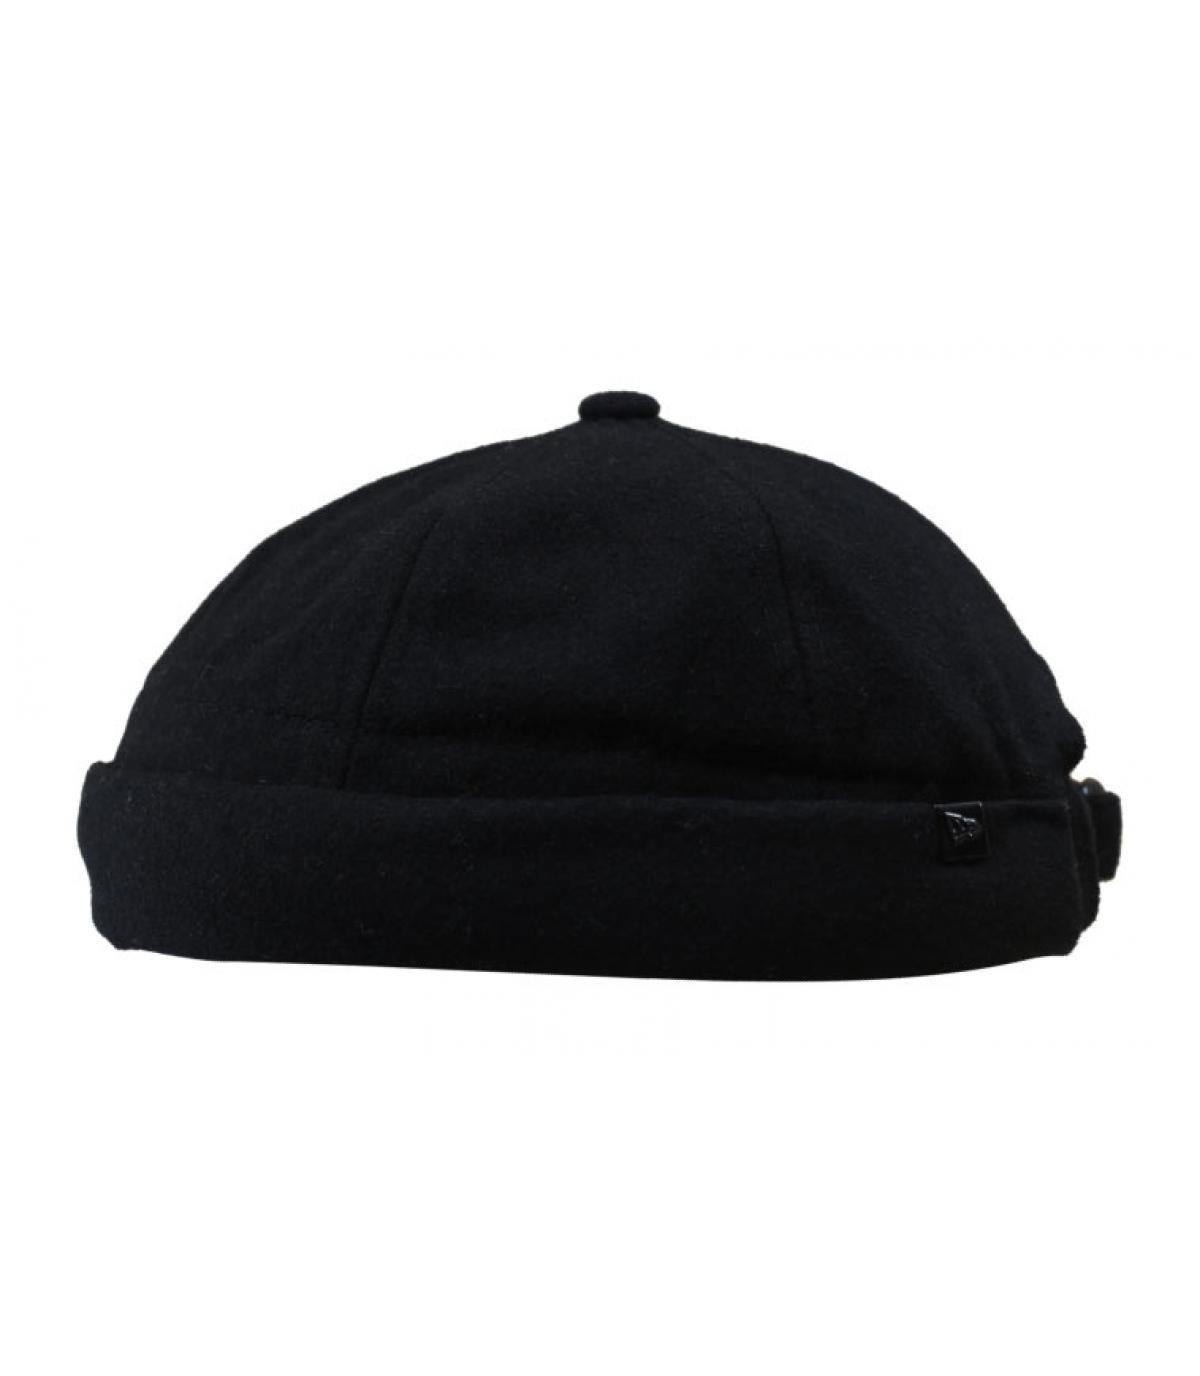 Détails NE Wool Skullcap black - image 2